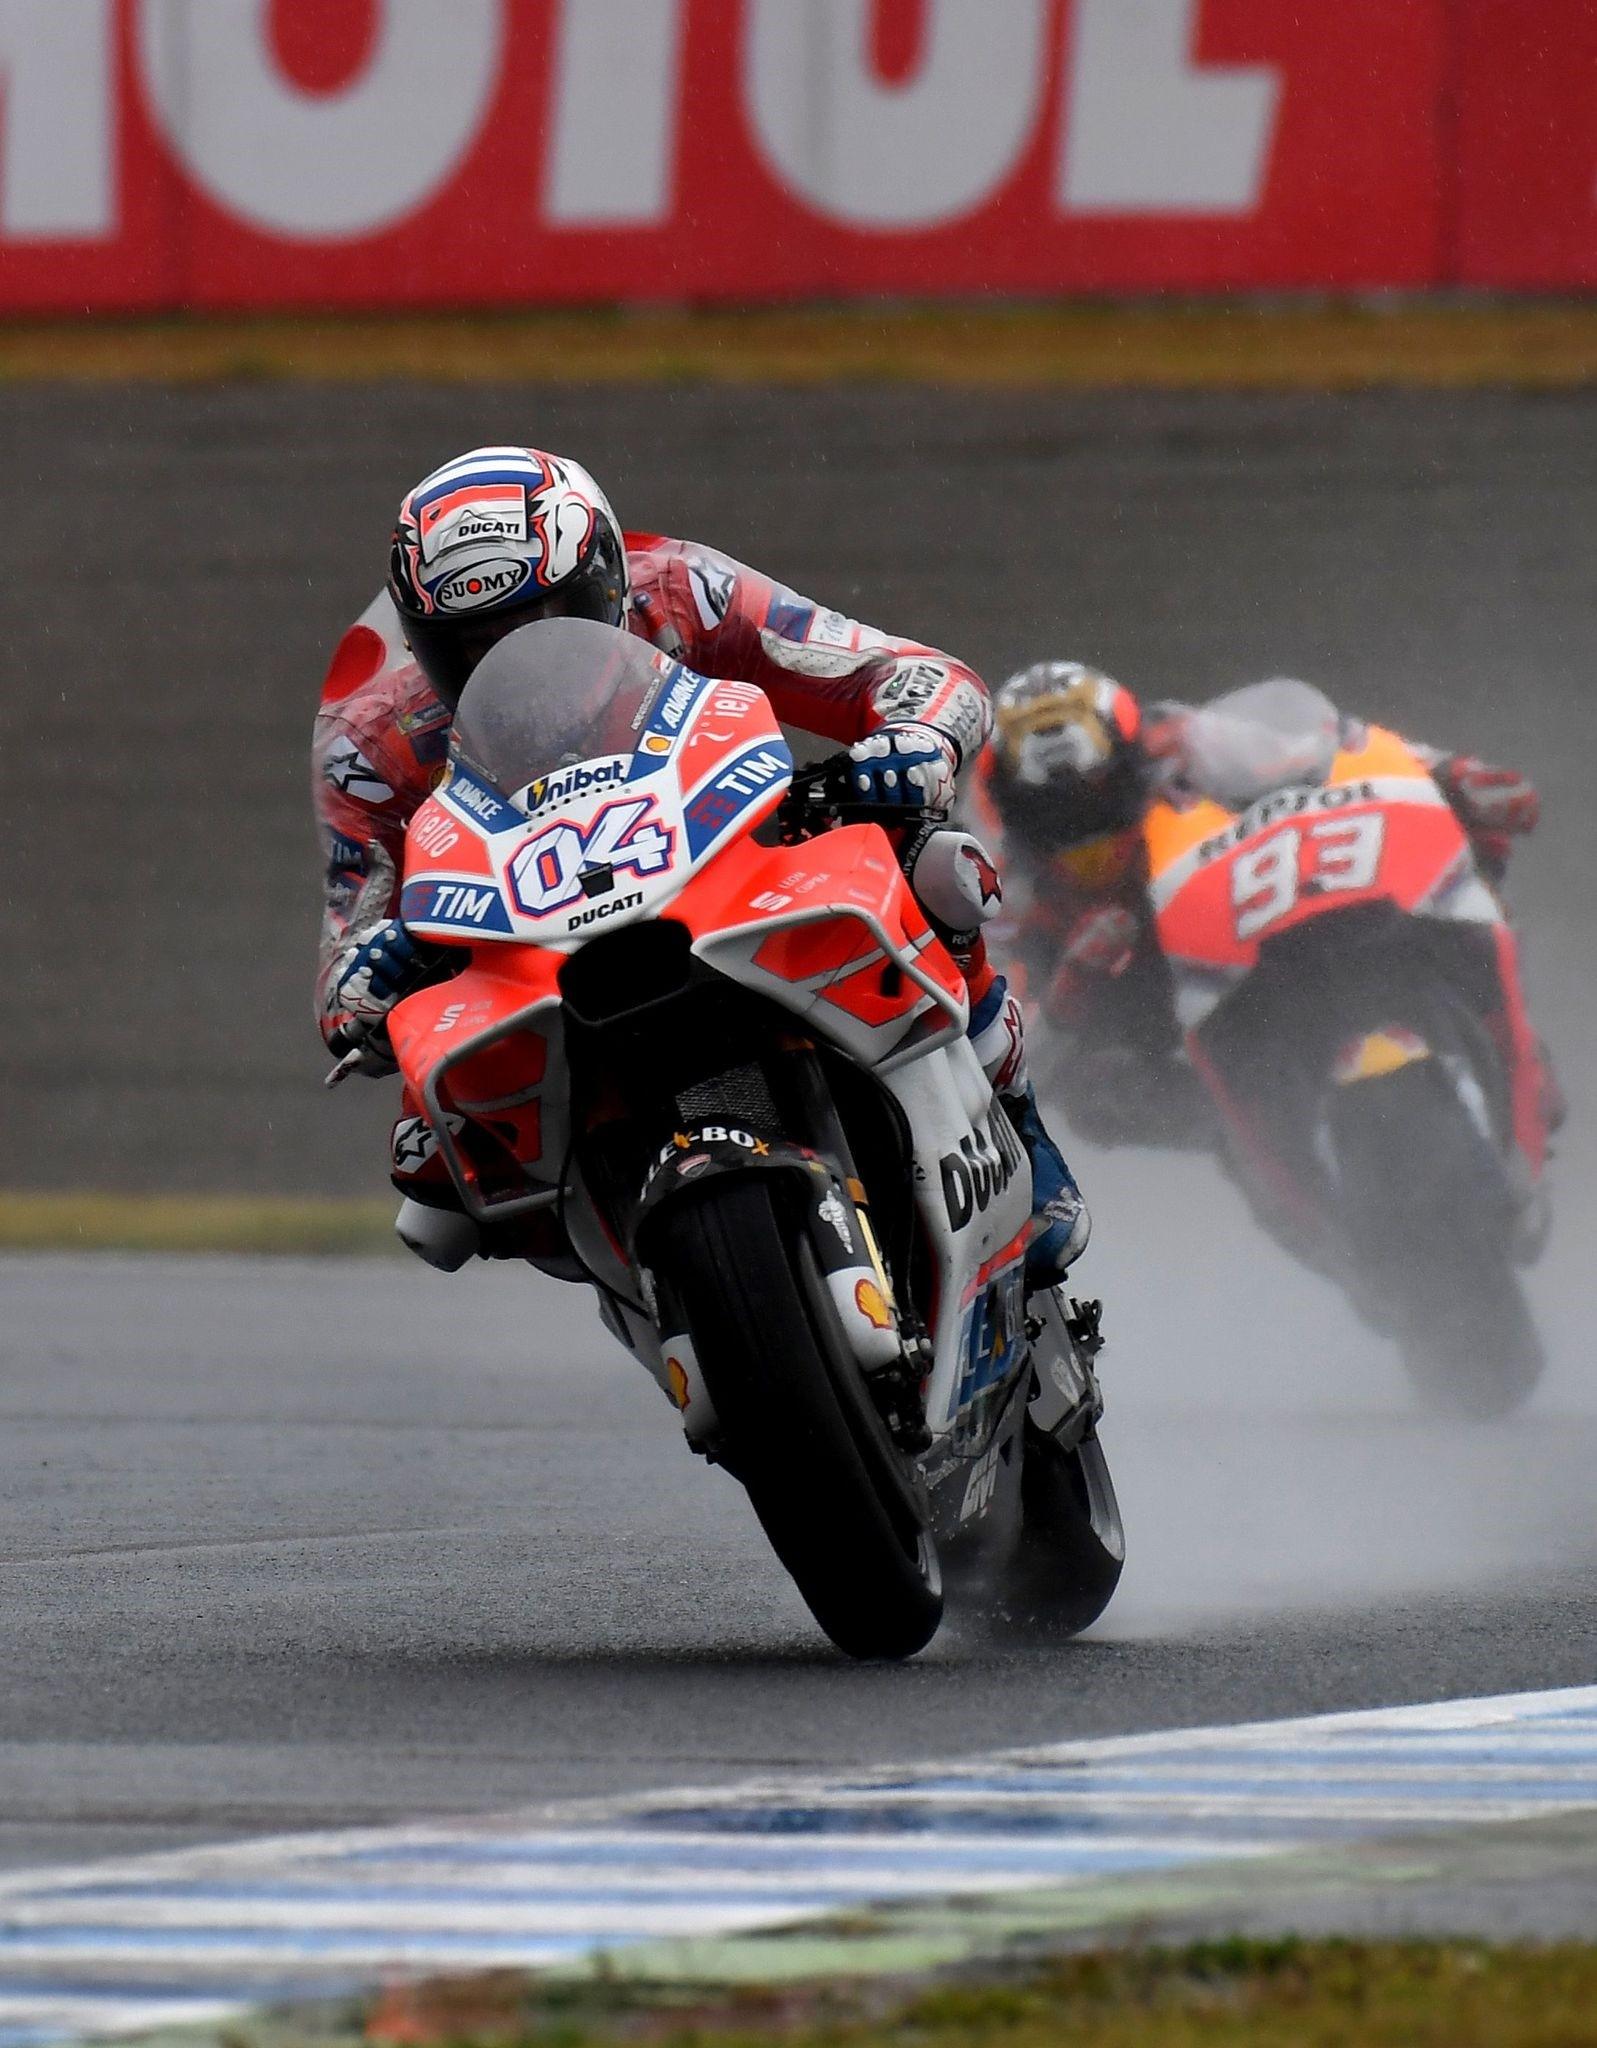 Ducati rider Andrea Dovizioso of Italy (L) leads Honda rider Marc Marquez of Spain (R) during the MotoGP Japanese Grand Prix at Twin Ring Motegi circuit in Motegi.